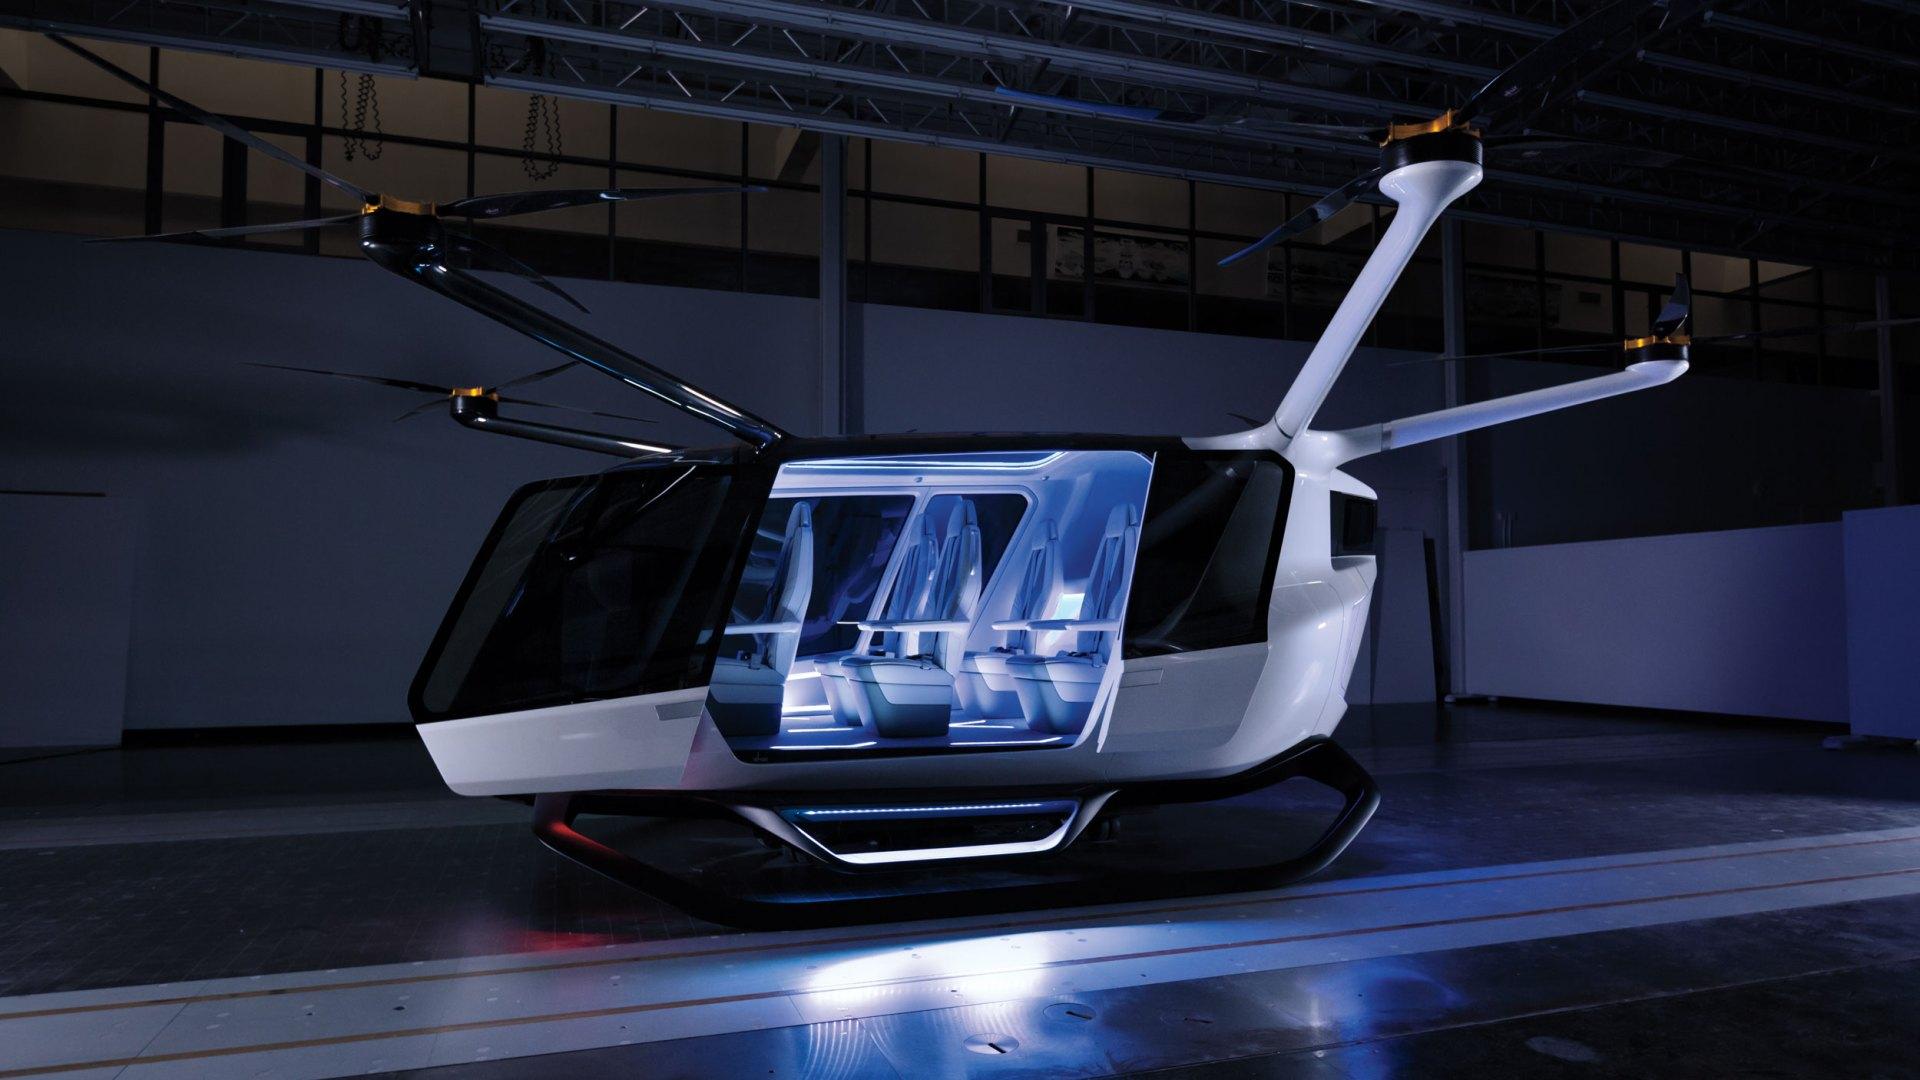 Skai Global hydrogen-powered aircraft concept